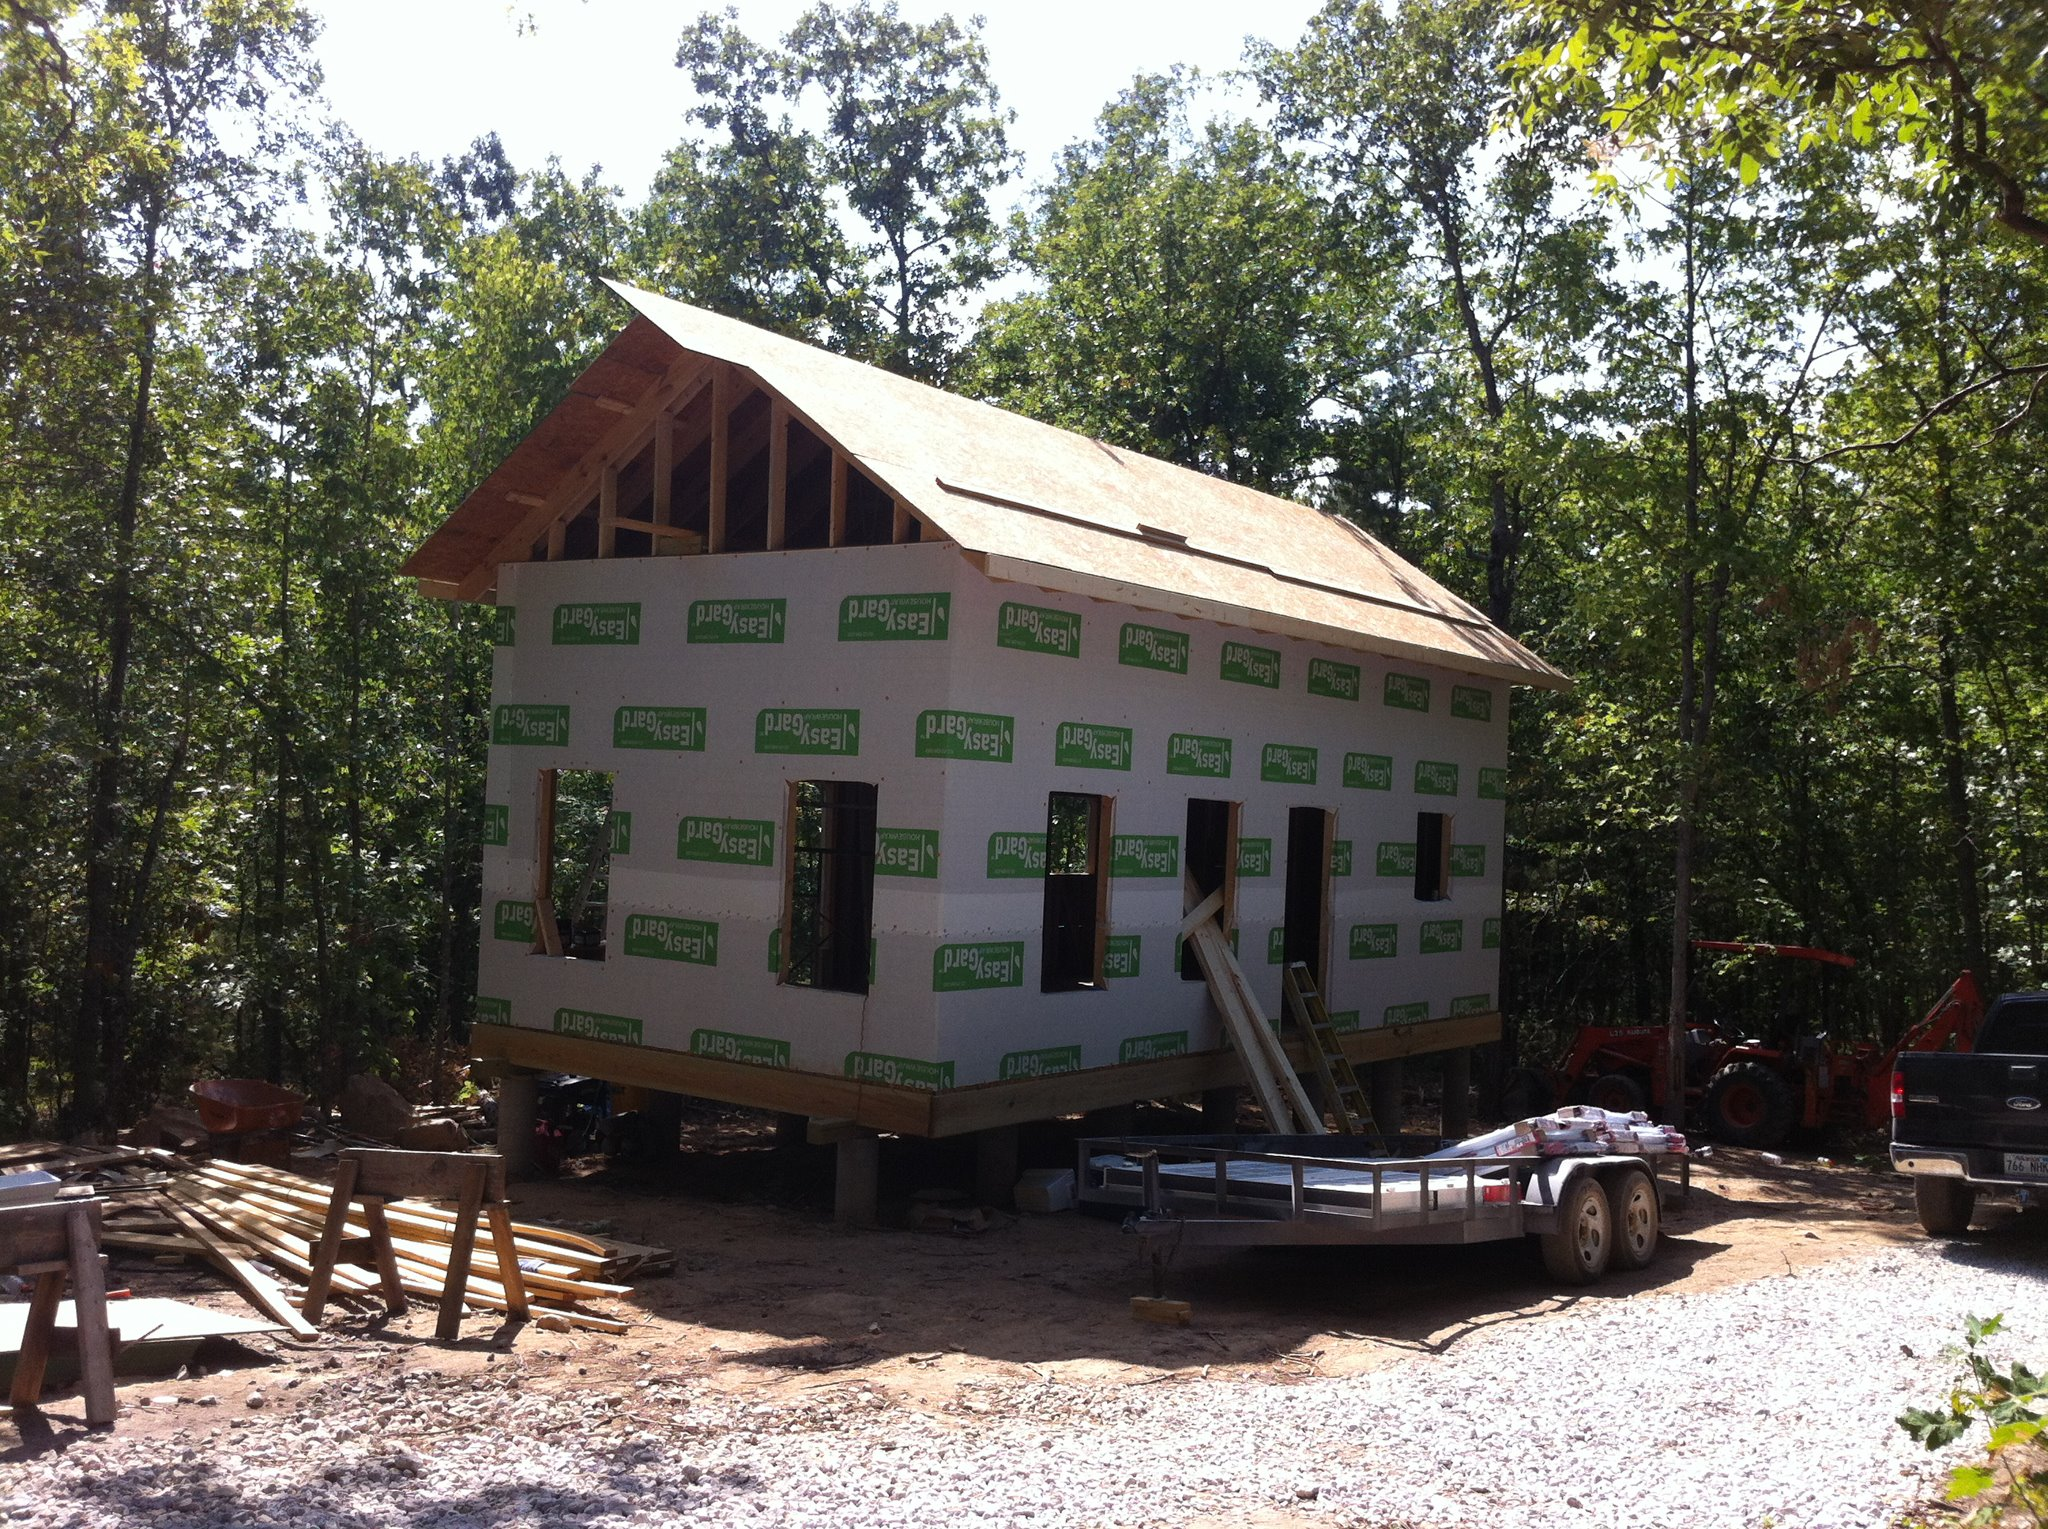 Jon's Cabin in the Woods